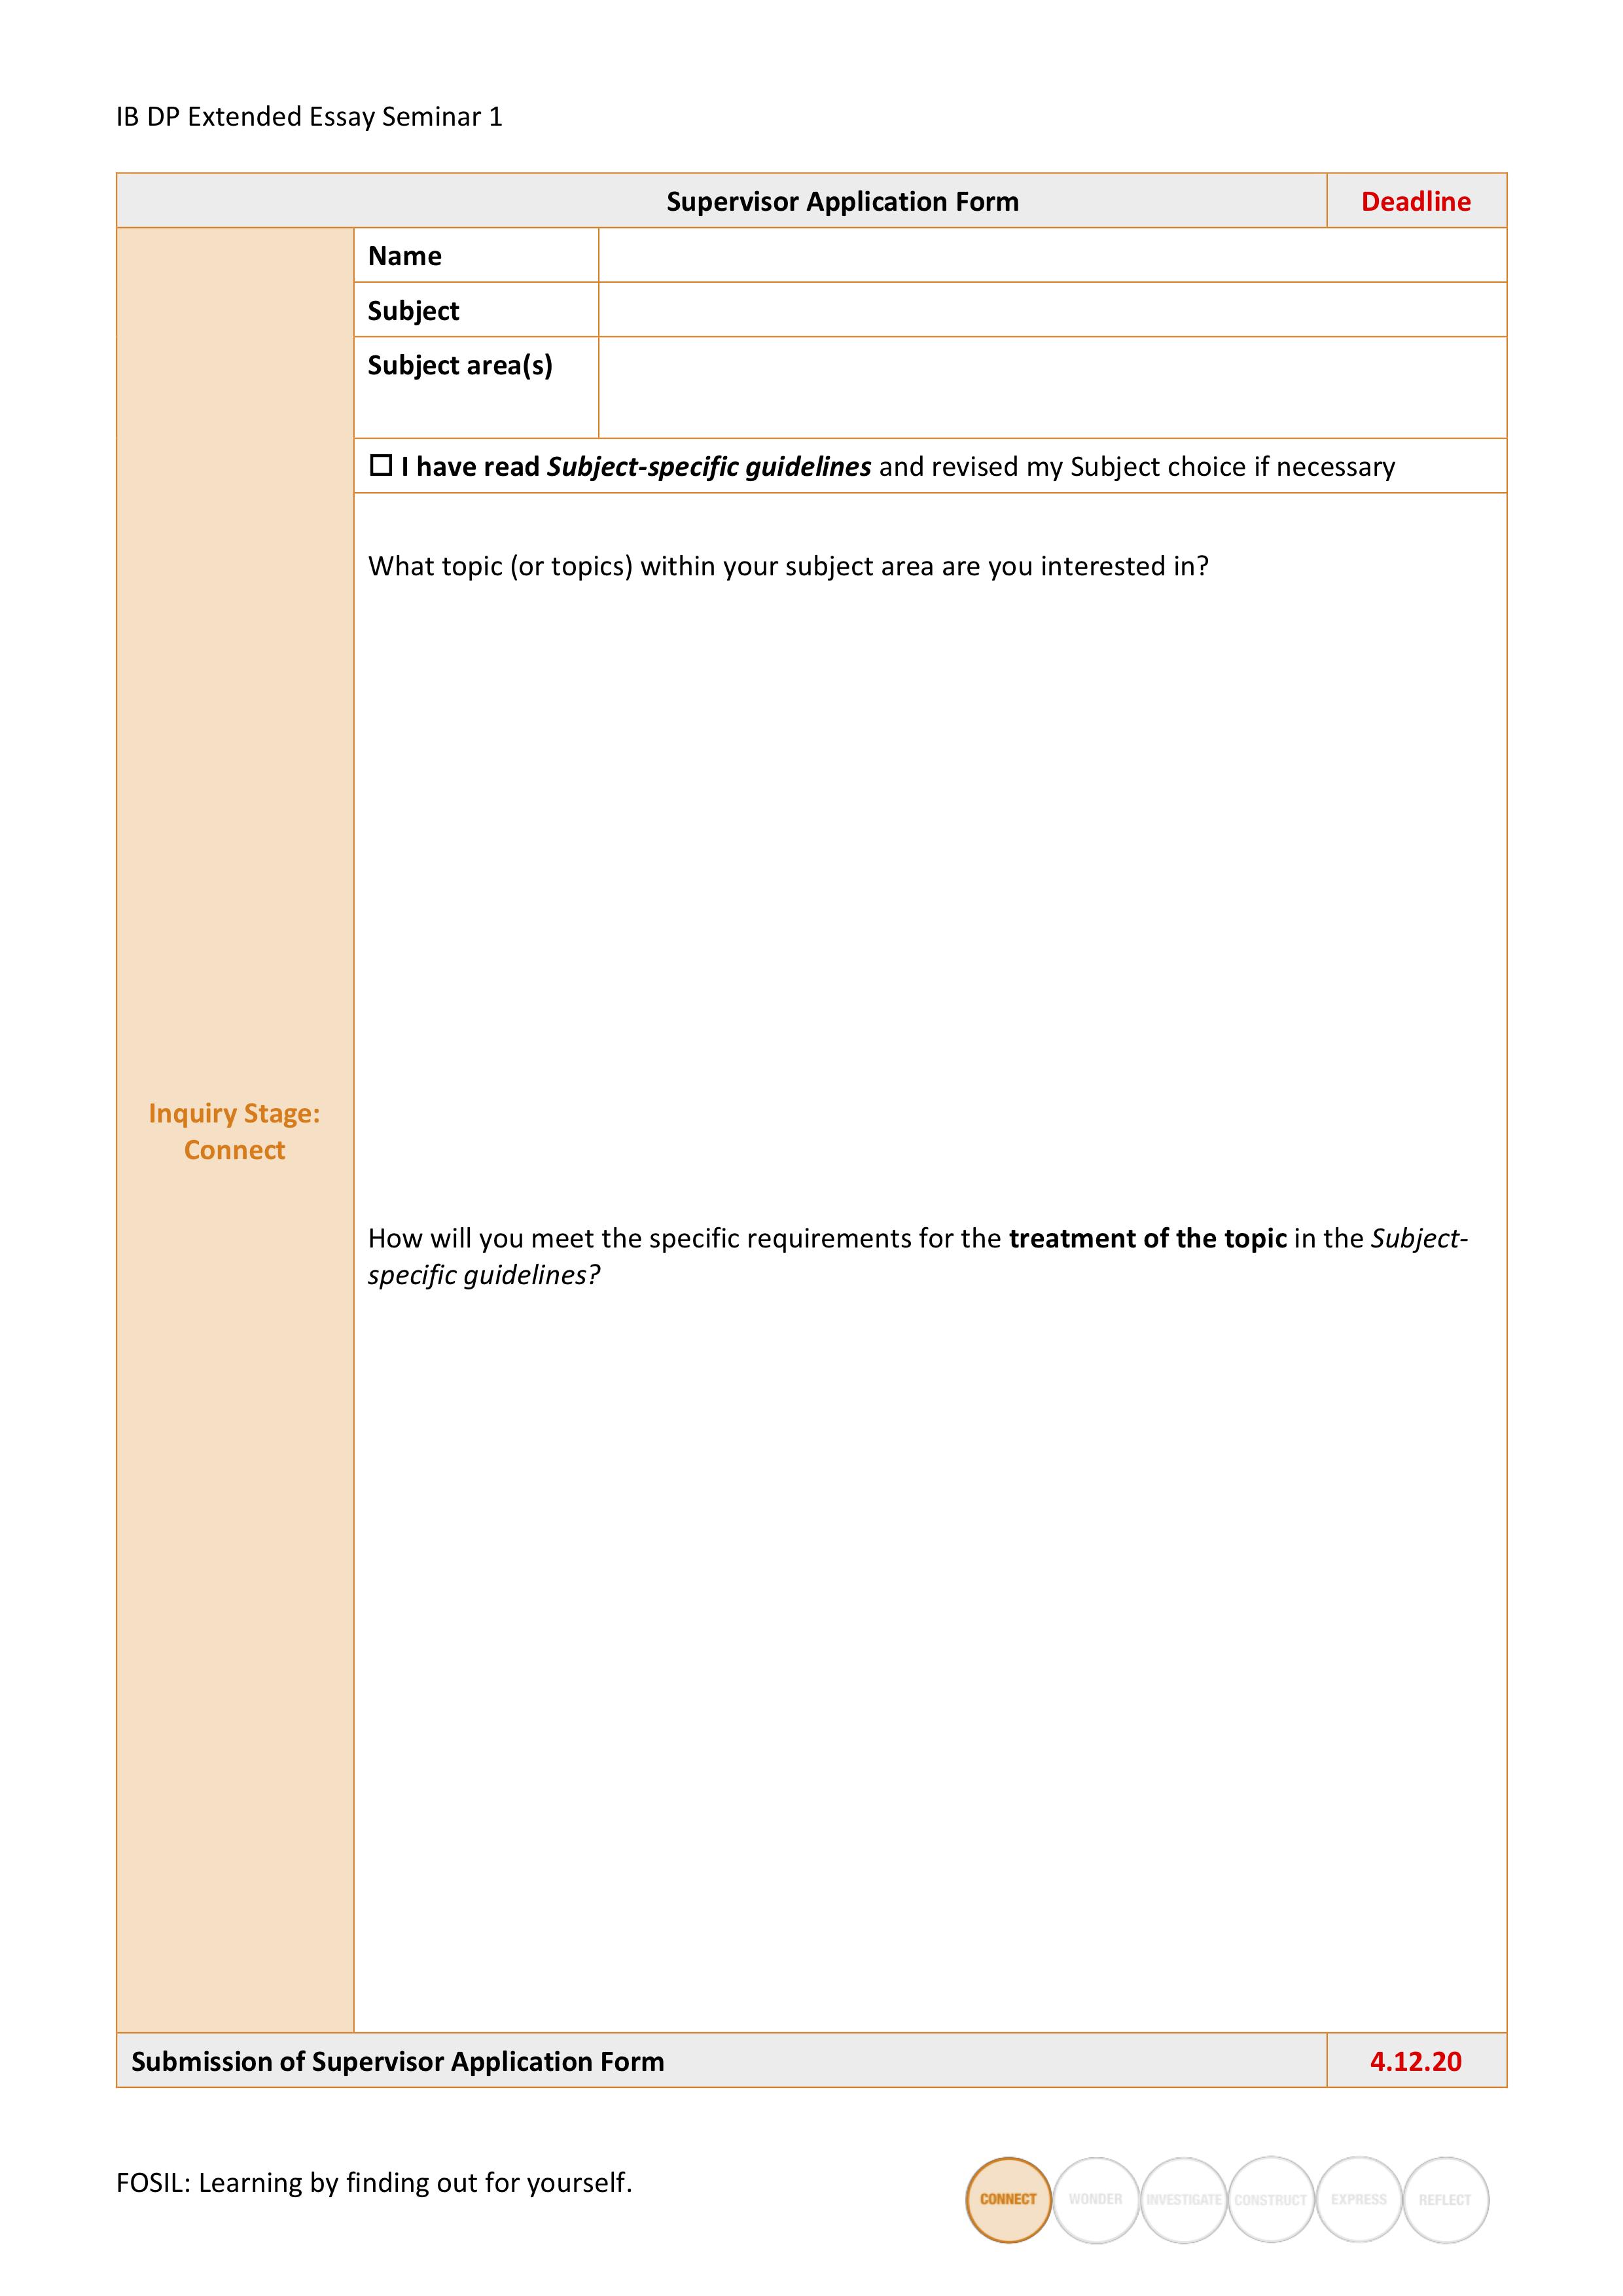 Supervisor application form